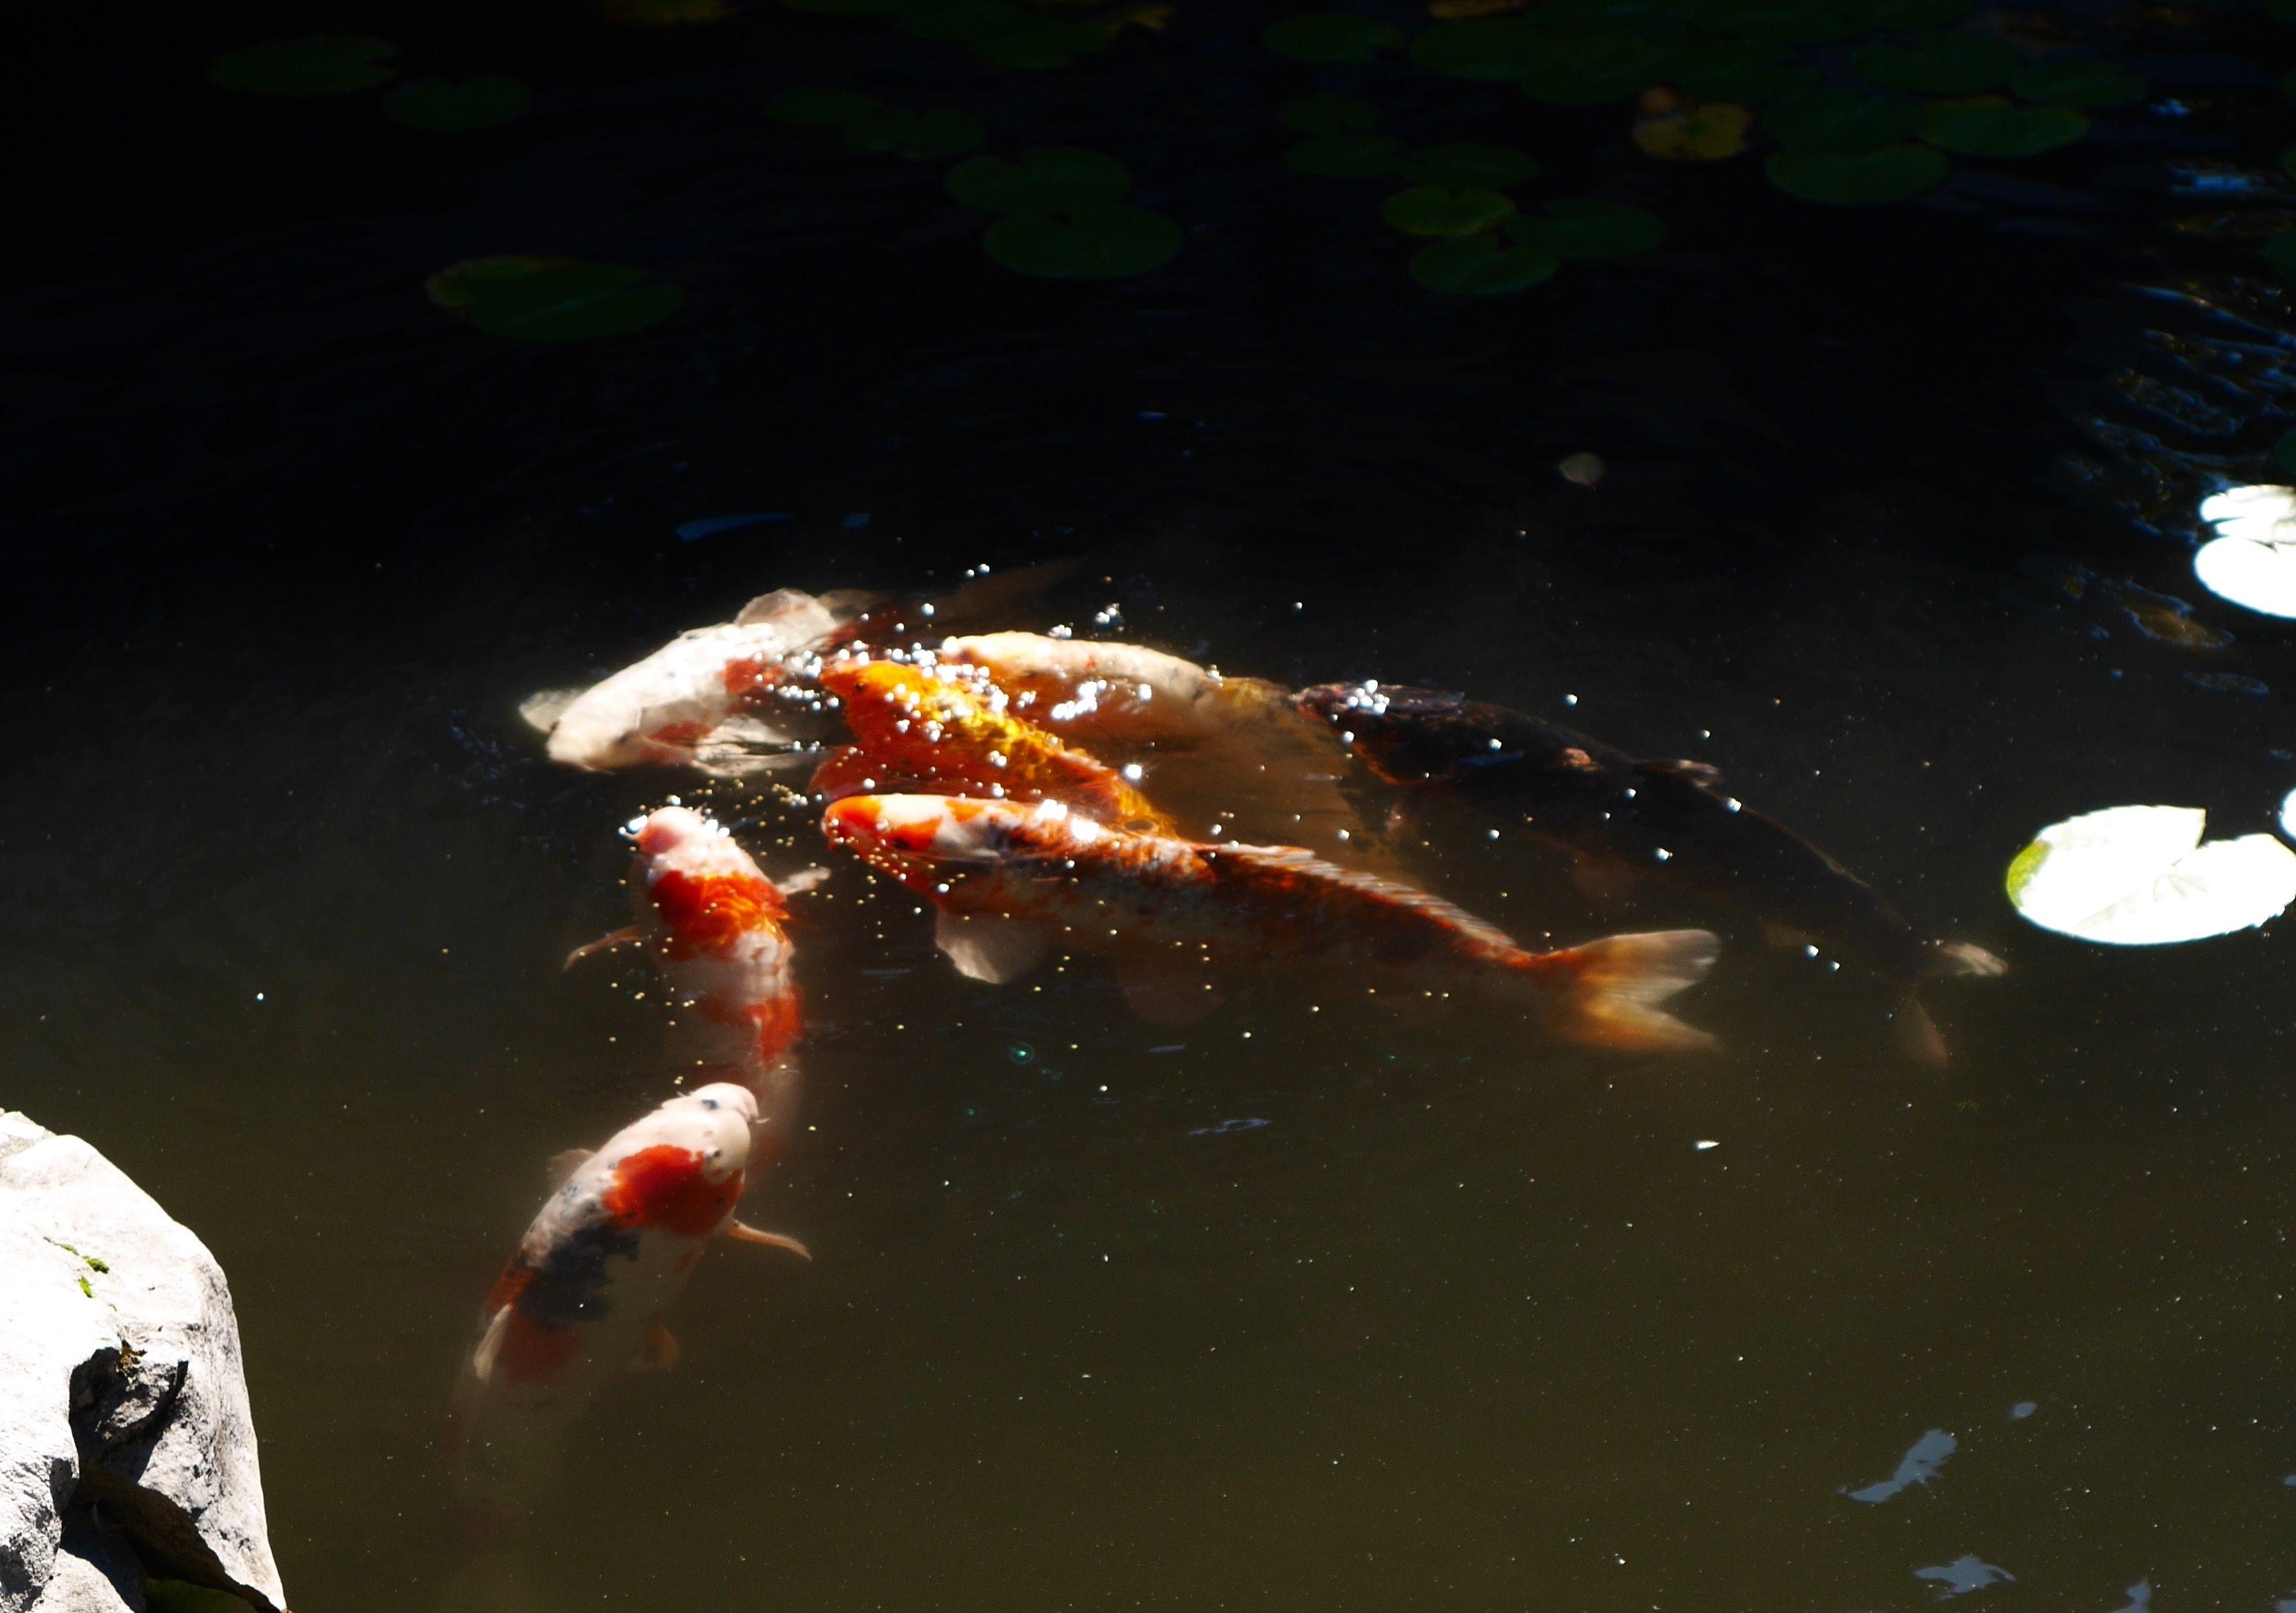 fish feeding - contrast of bright fish in murky water | SUN YET SEN ...